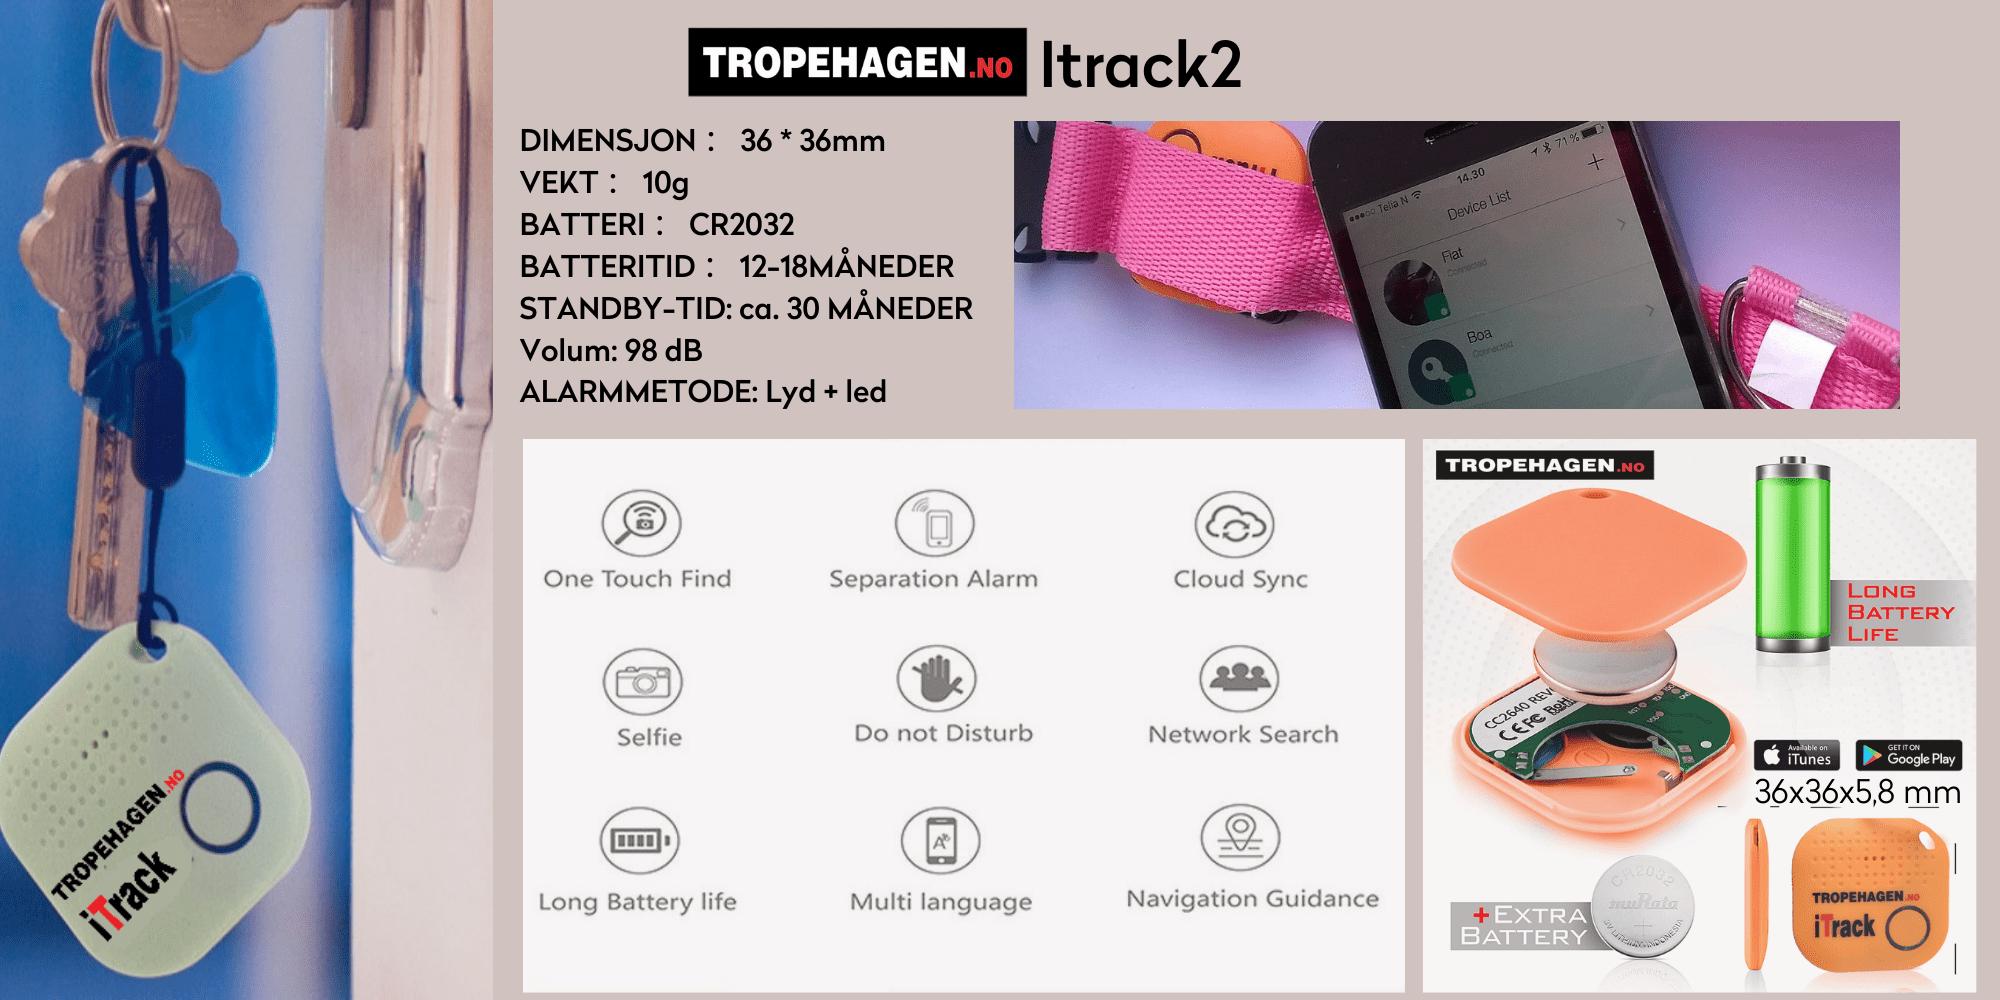 Itrack2 tropehagen.no